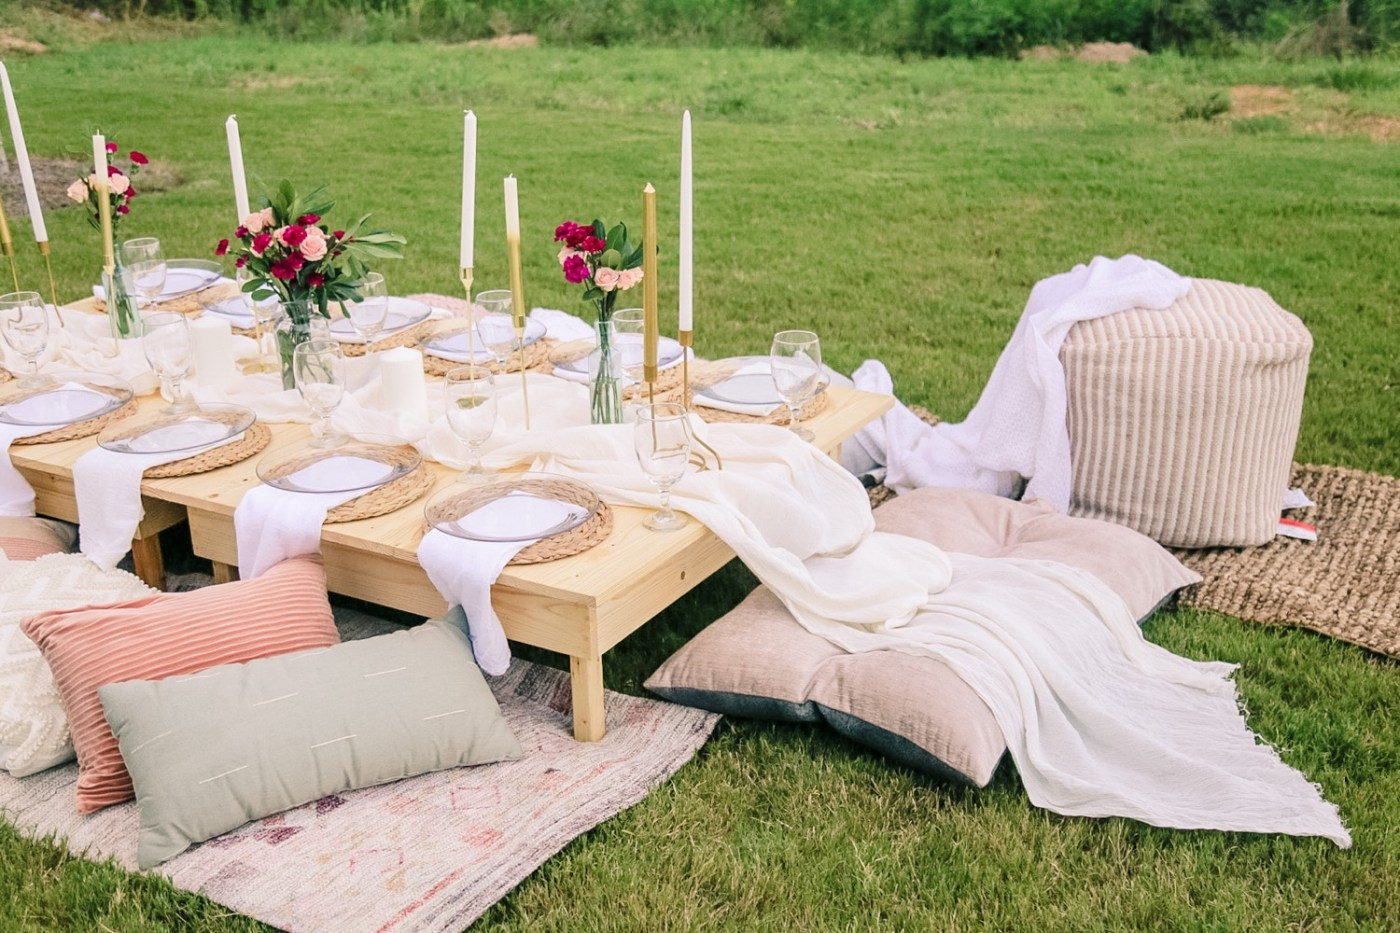 Birmingham Picnic Company luxury picnic